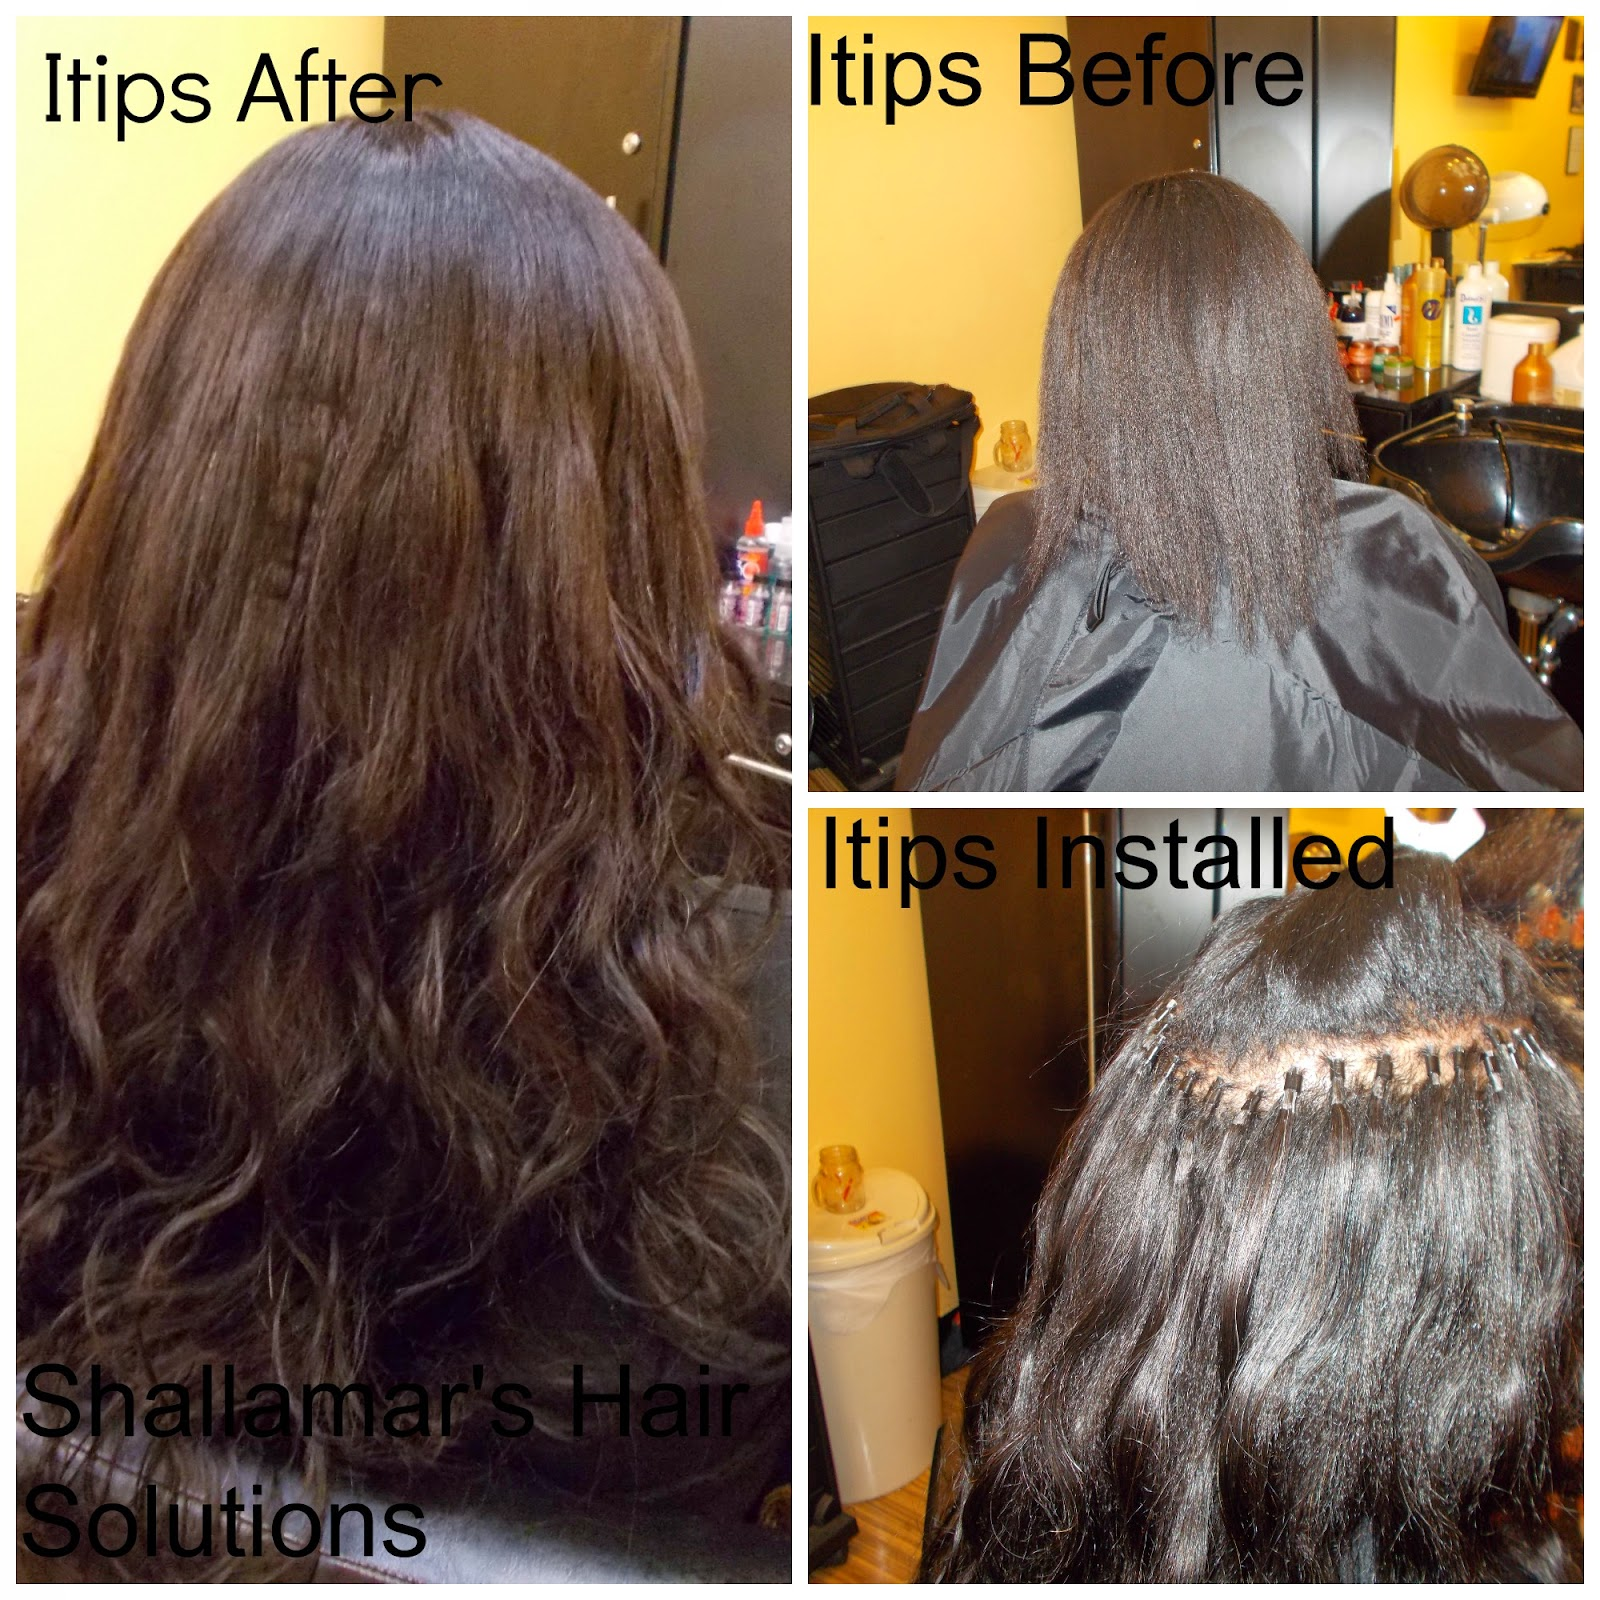 Hair Replacement Orlando Orlando Utips Hair Extensions Vs I Tips